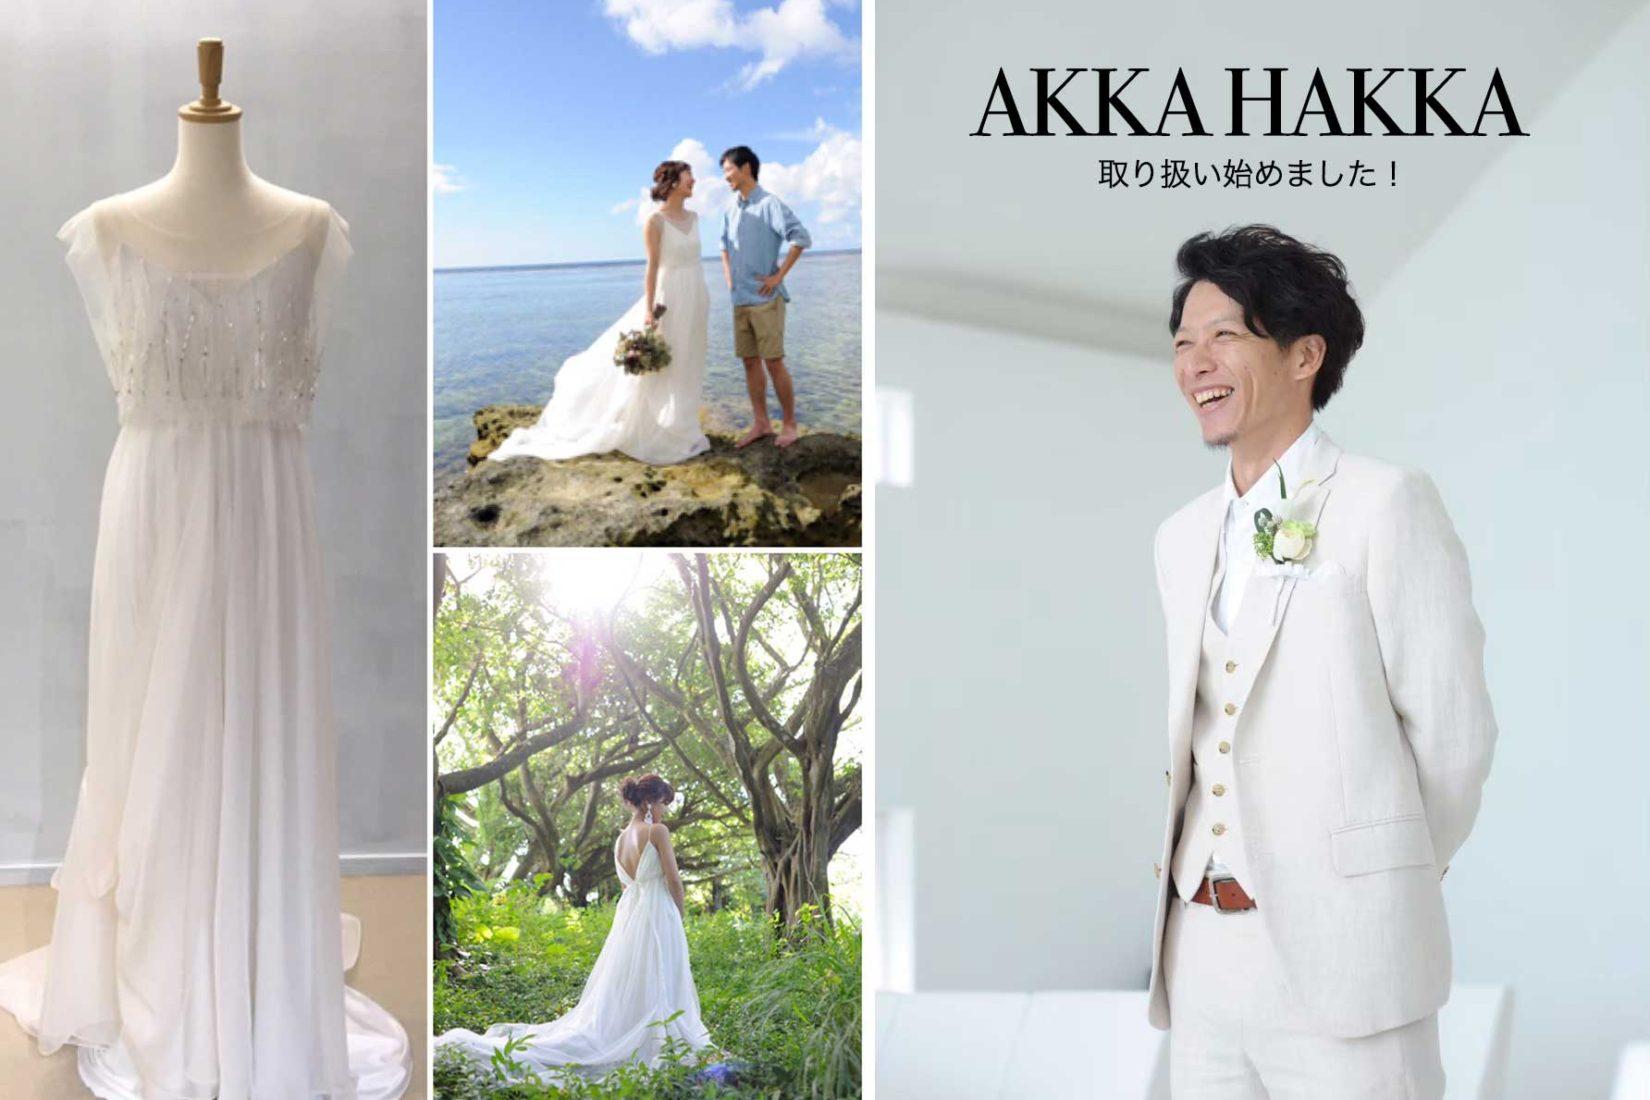 【AKKA HAKKA】のドレス&タキシードの取り扱いを始めました!